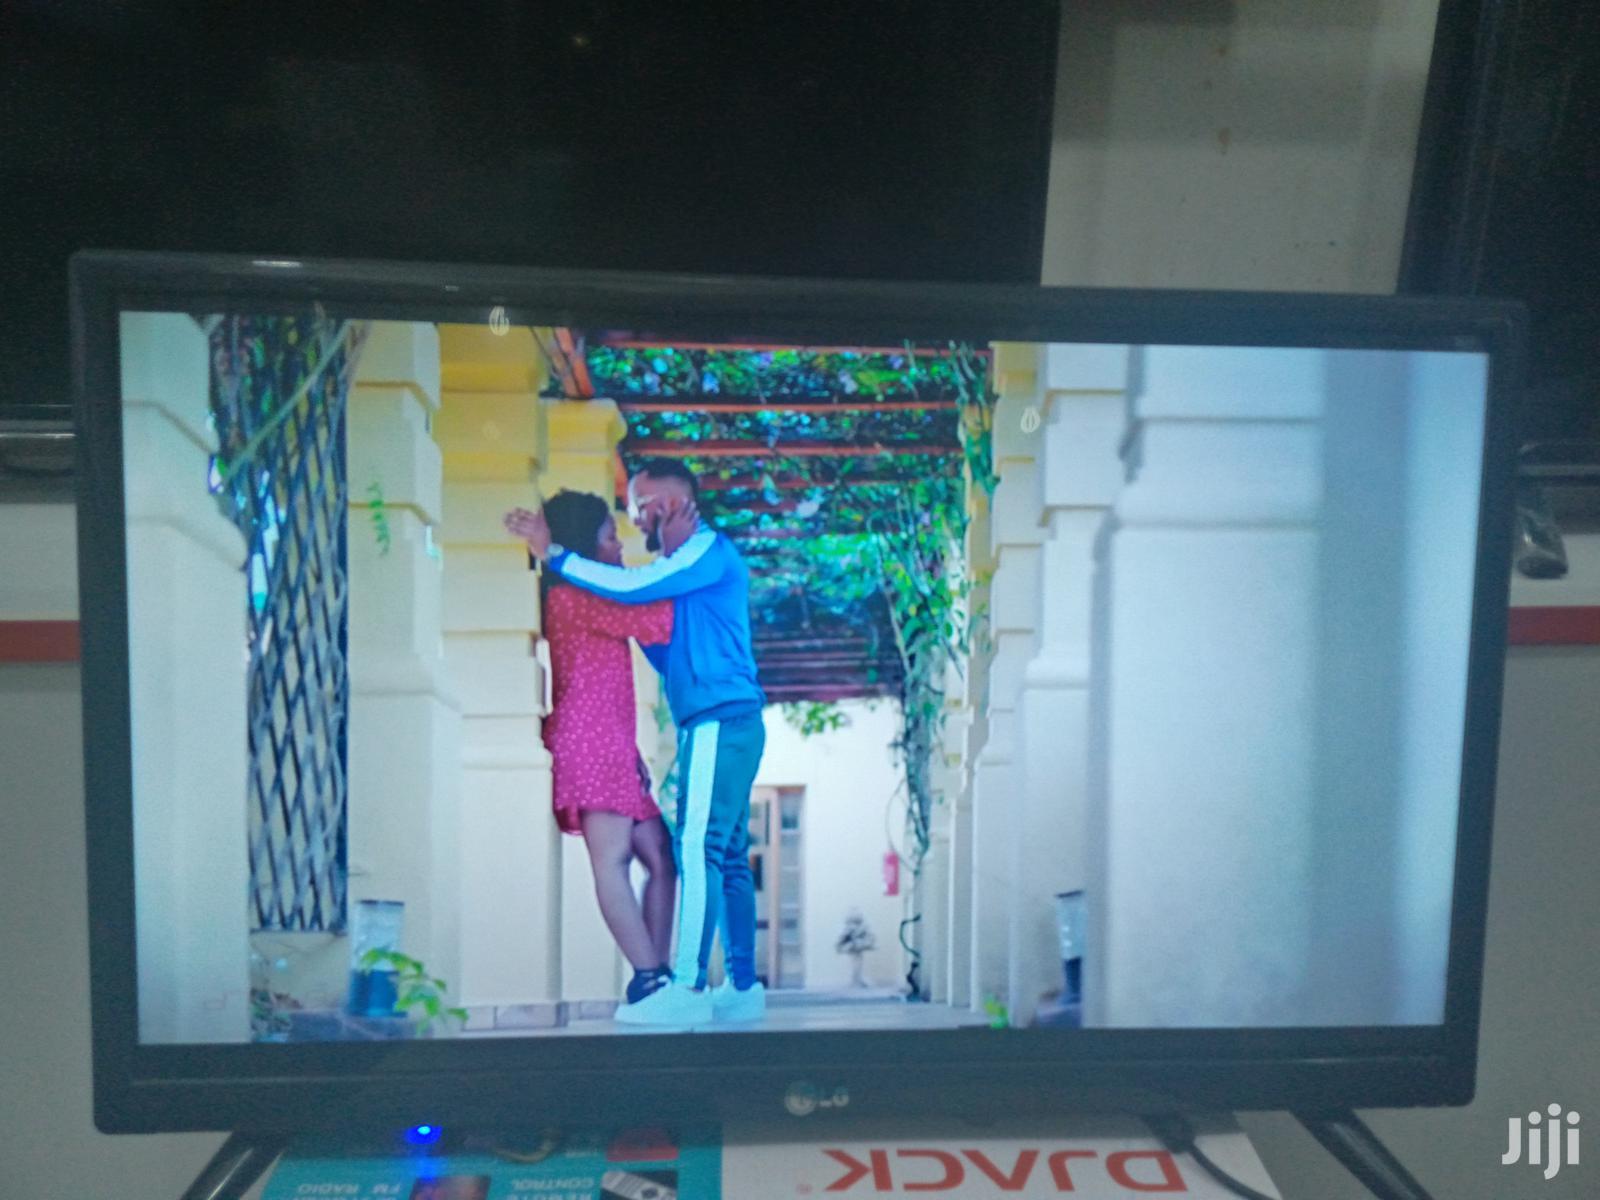 26 Inches Led Lg Flat Screen Digital | TV & DVD Equipment for sale in Kampala, Central Region, Uganda